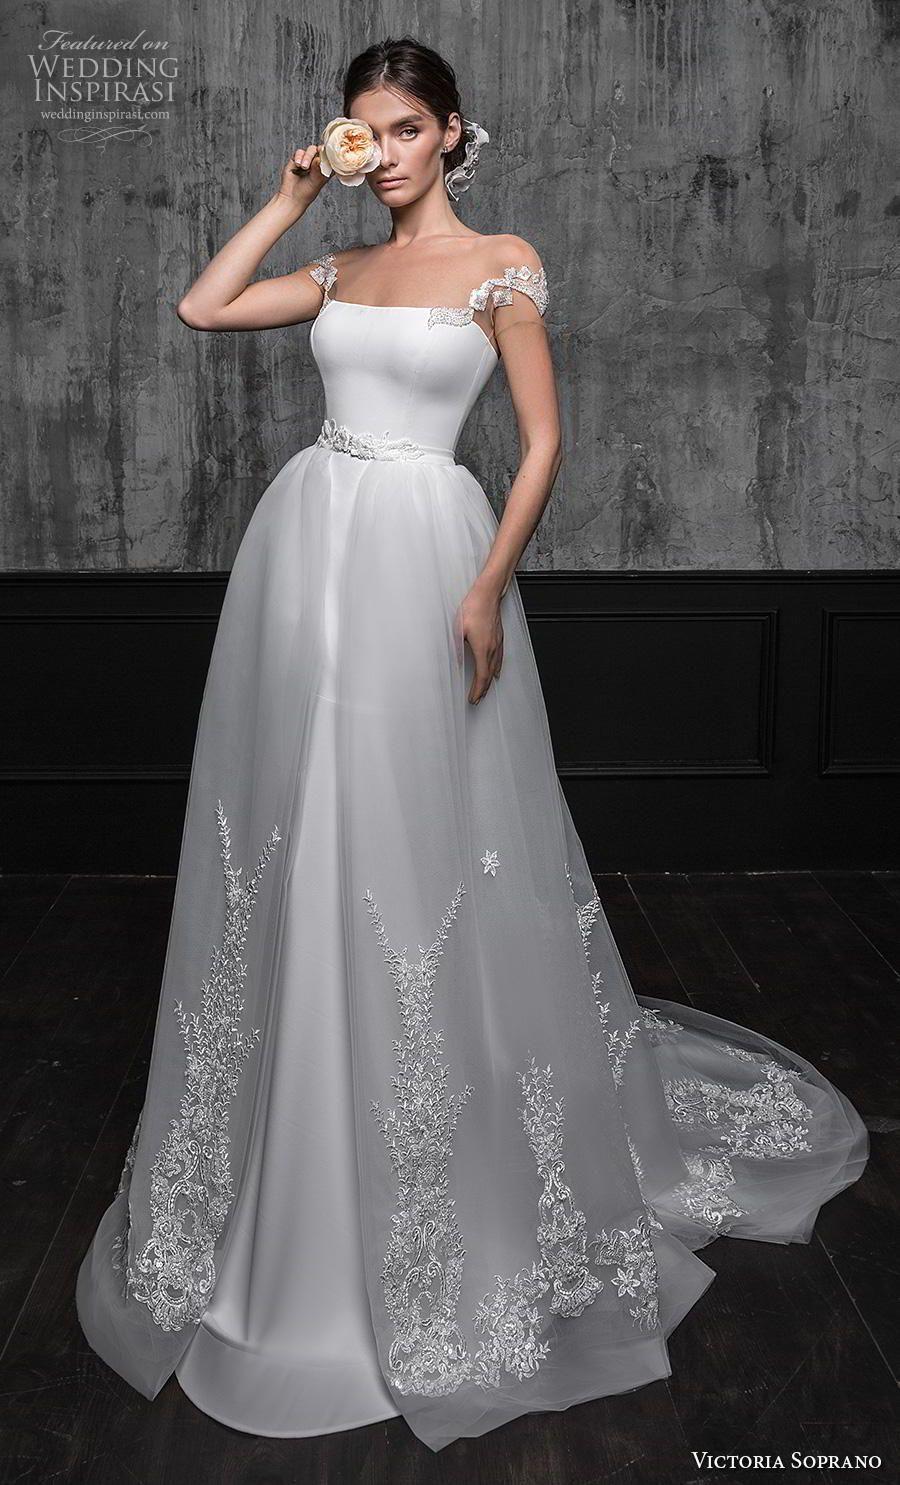 victoria soprano 2020 bridal cap sleeves illusion bateau